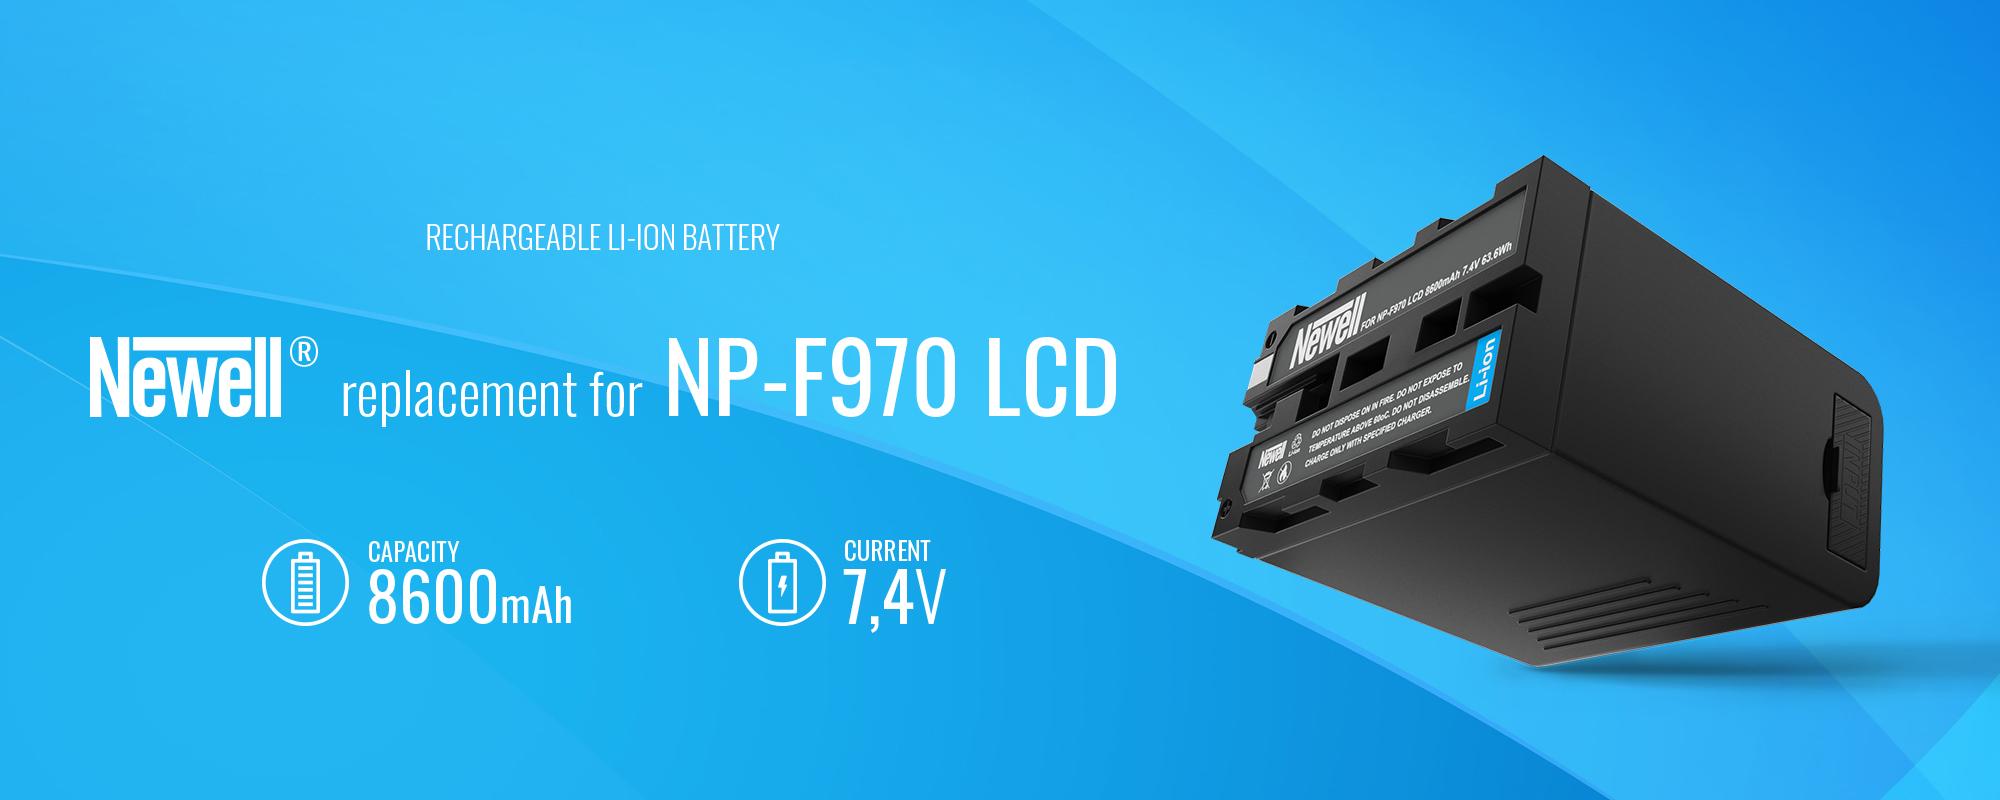 akumulator litowo jonowy na niebieskim tle NP-F970 8600mAh 7,4V Newell